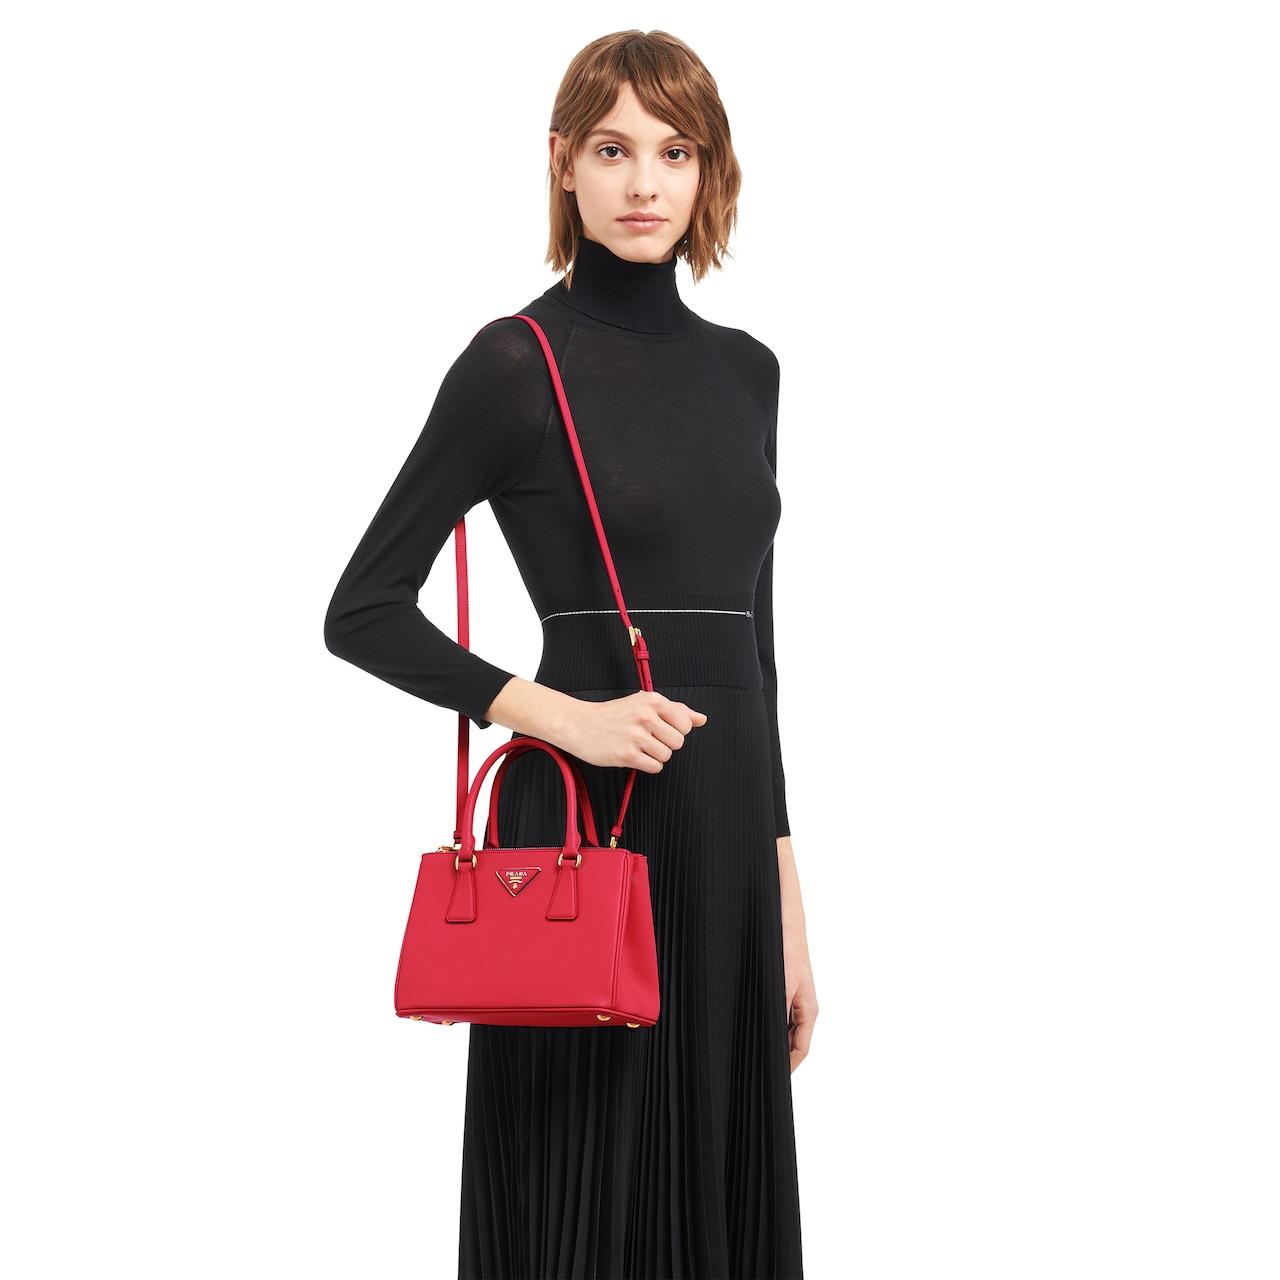 Prada Galleria Mini Saffiano Leather Bag